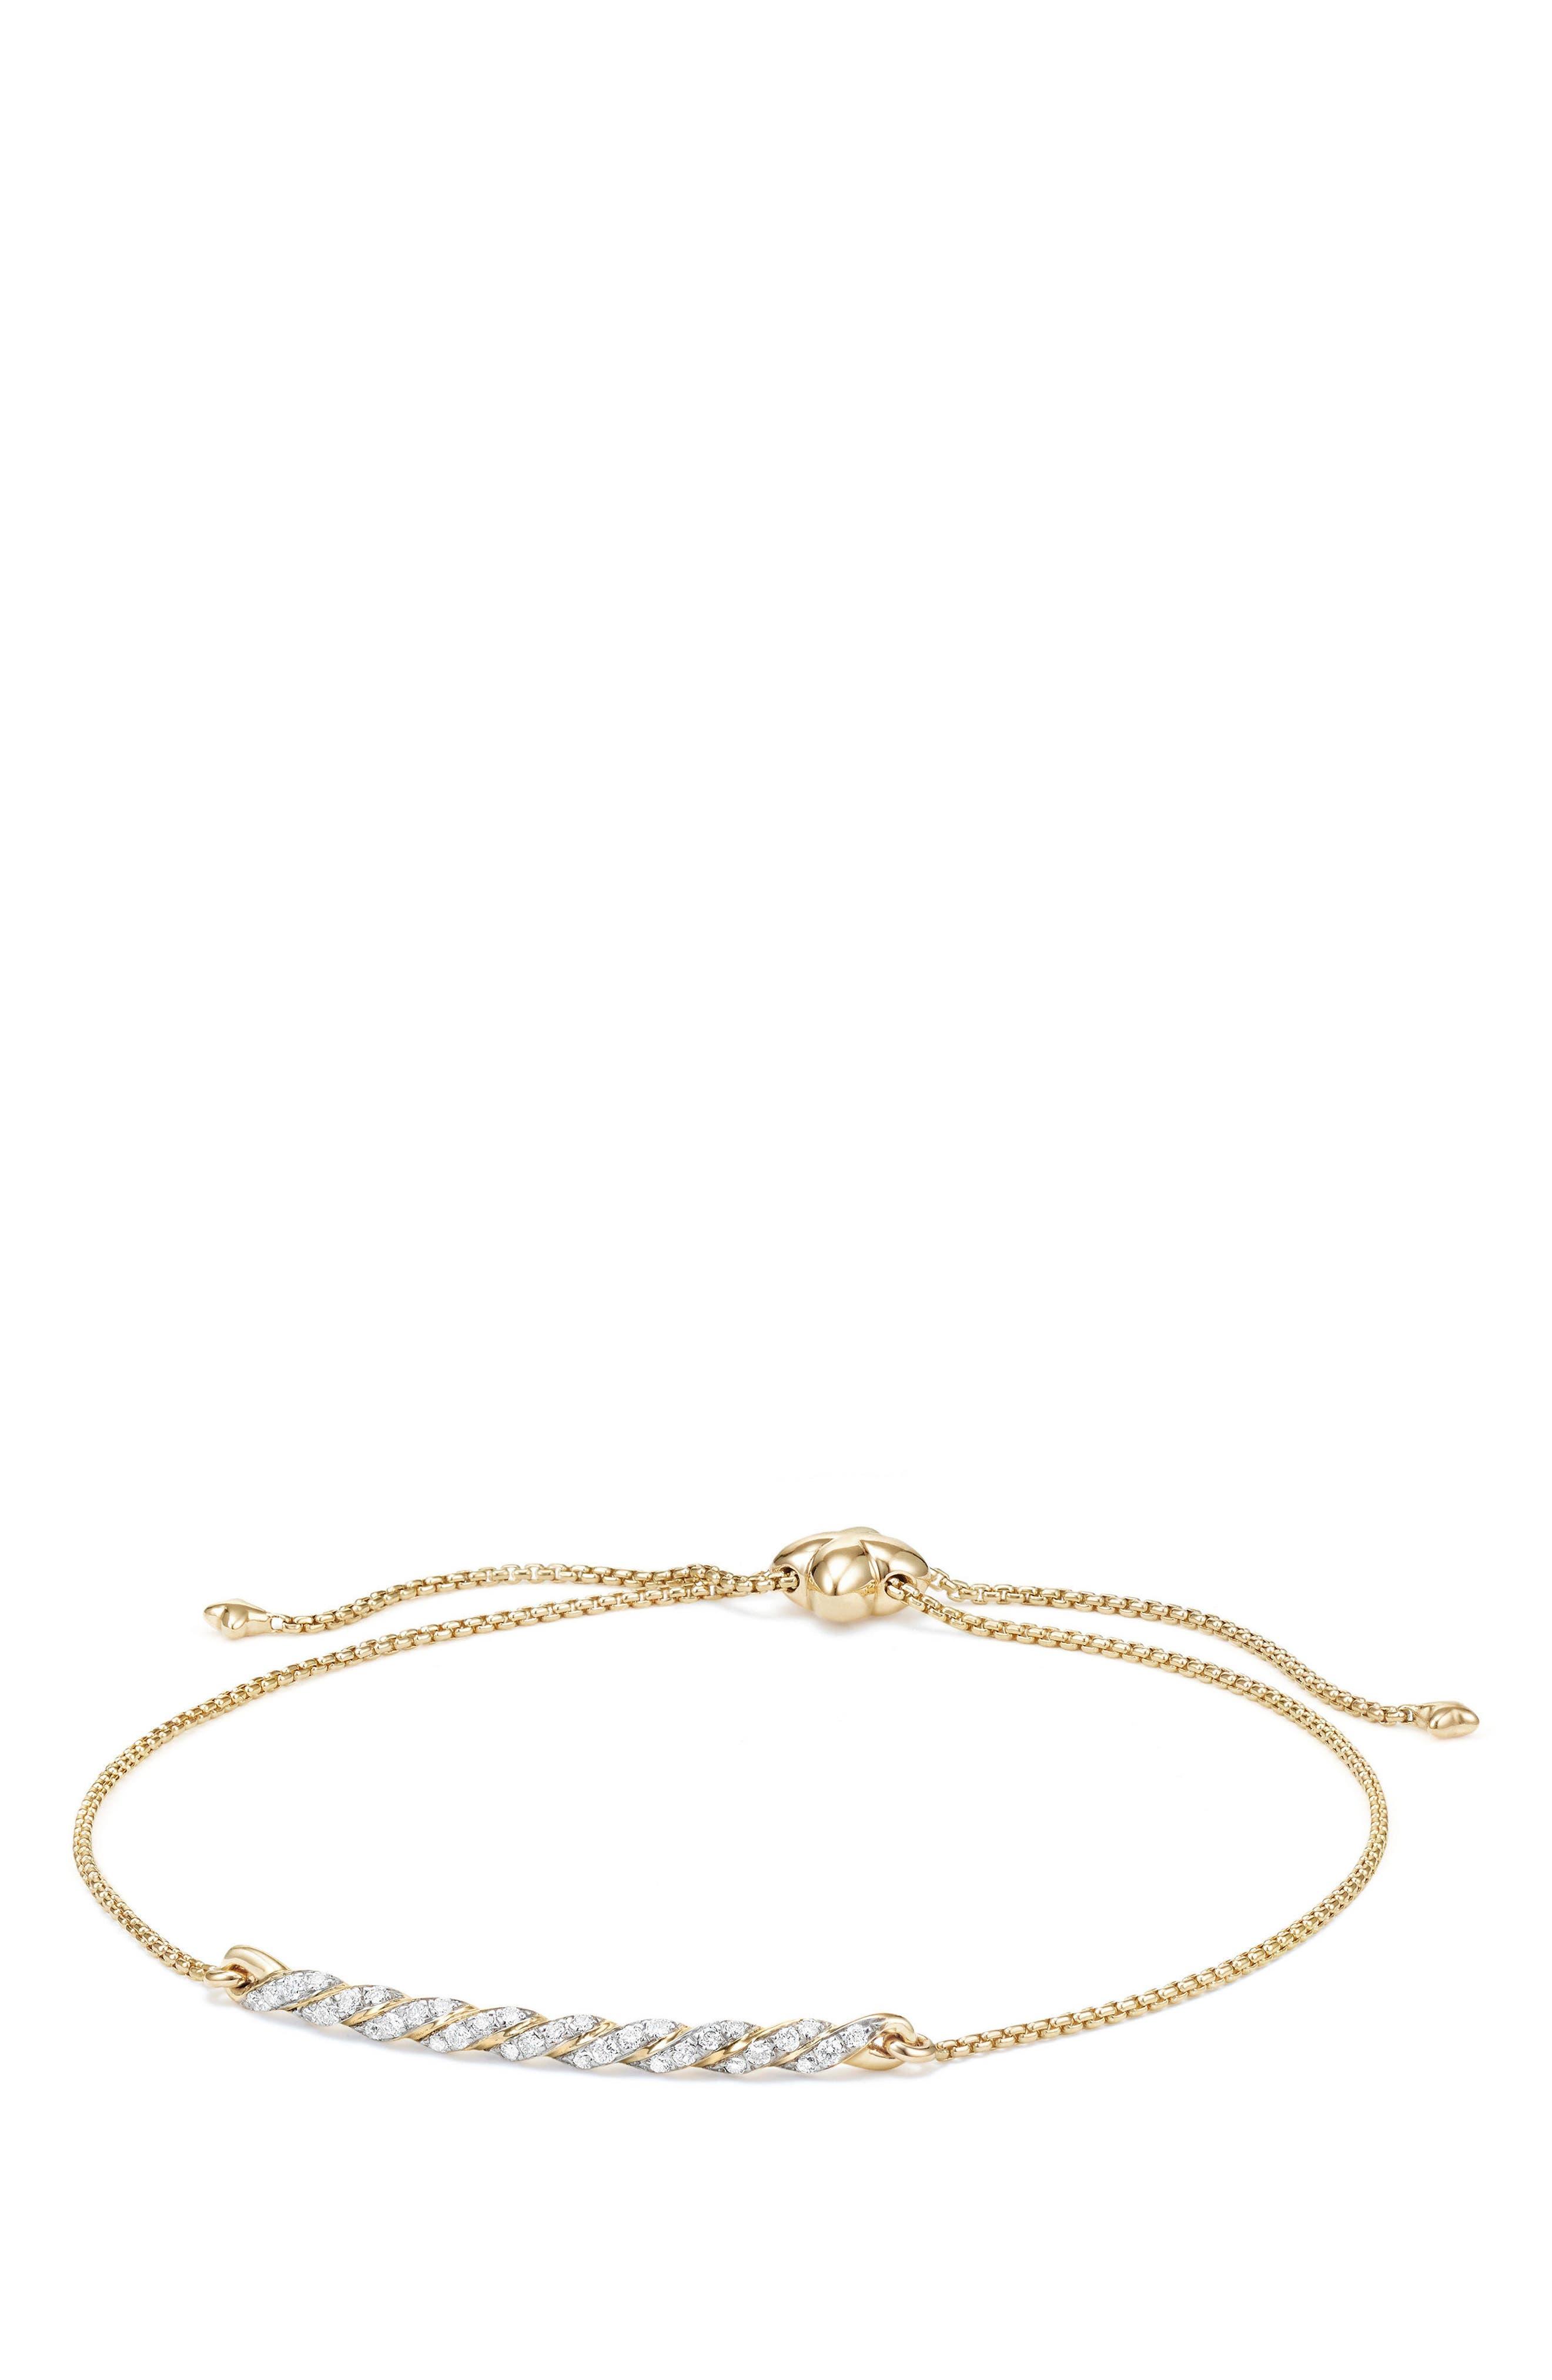 David Yurman Paveflex Station Bracelet with Diamonds in 18K Gold